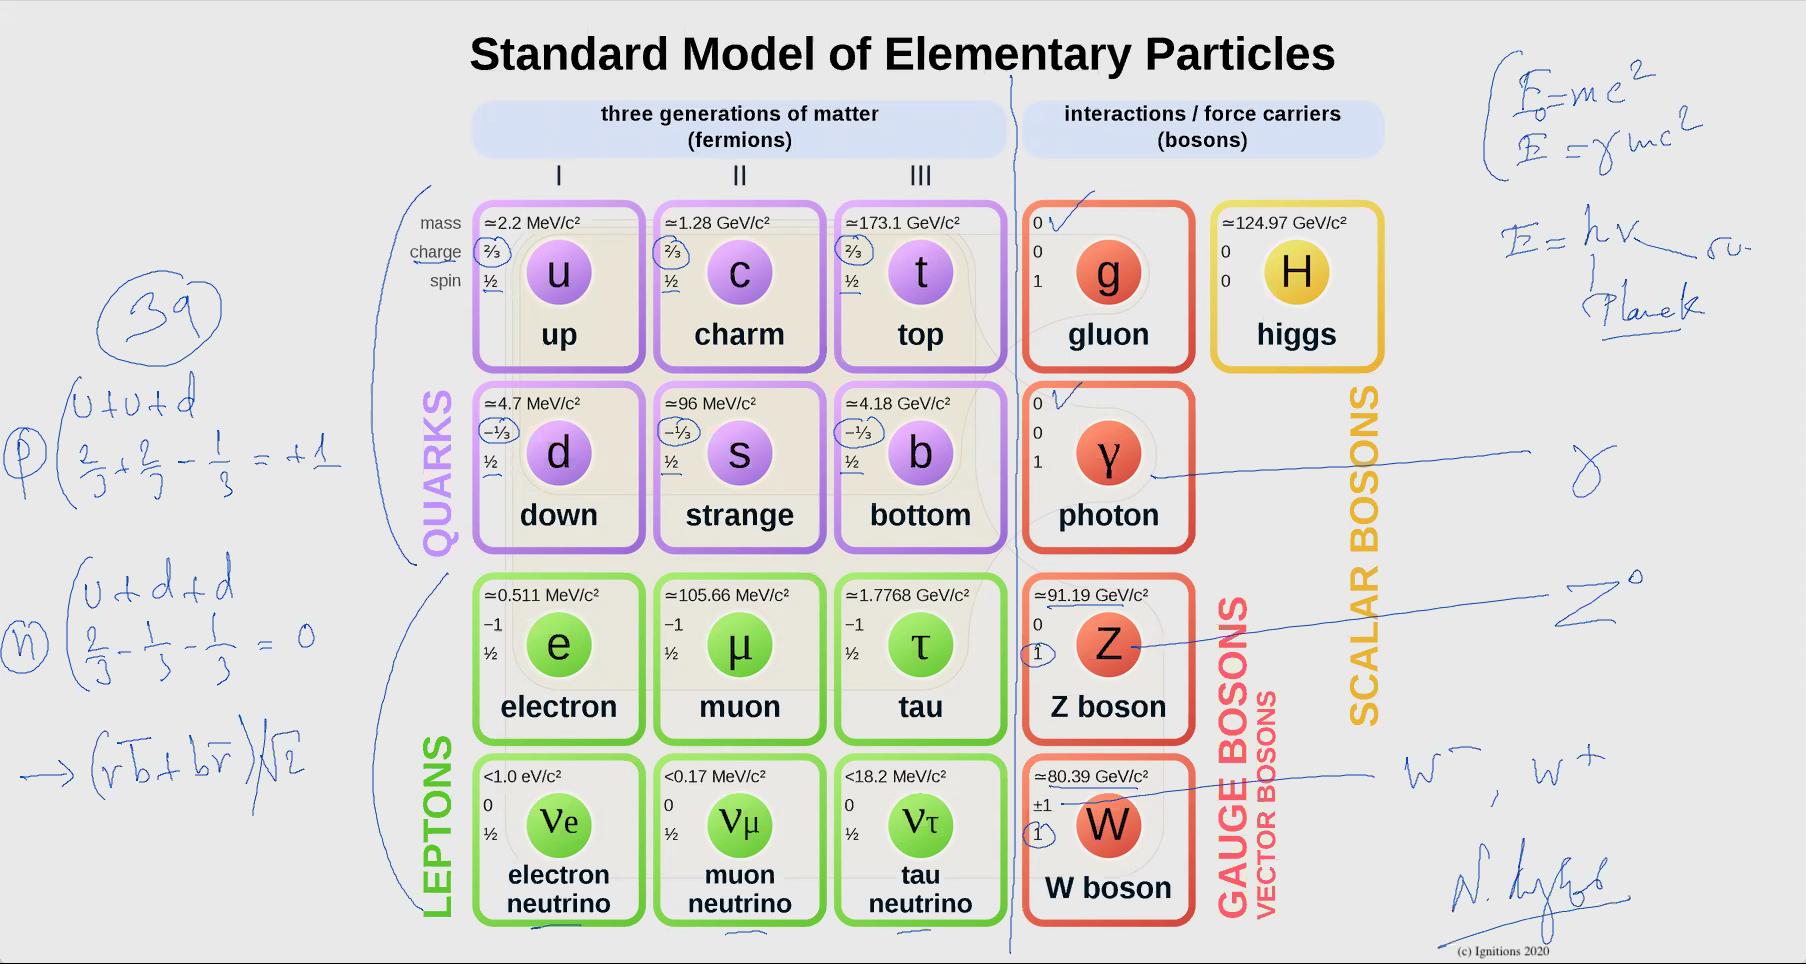 56170 - e-Μάθημα III: Κβαντική σκακιέρα. (Dessin)